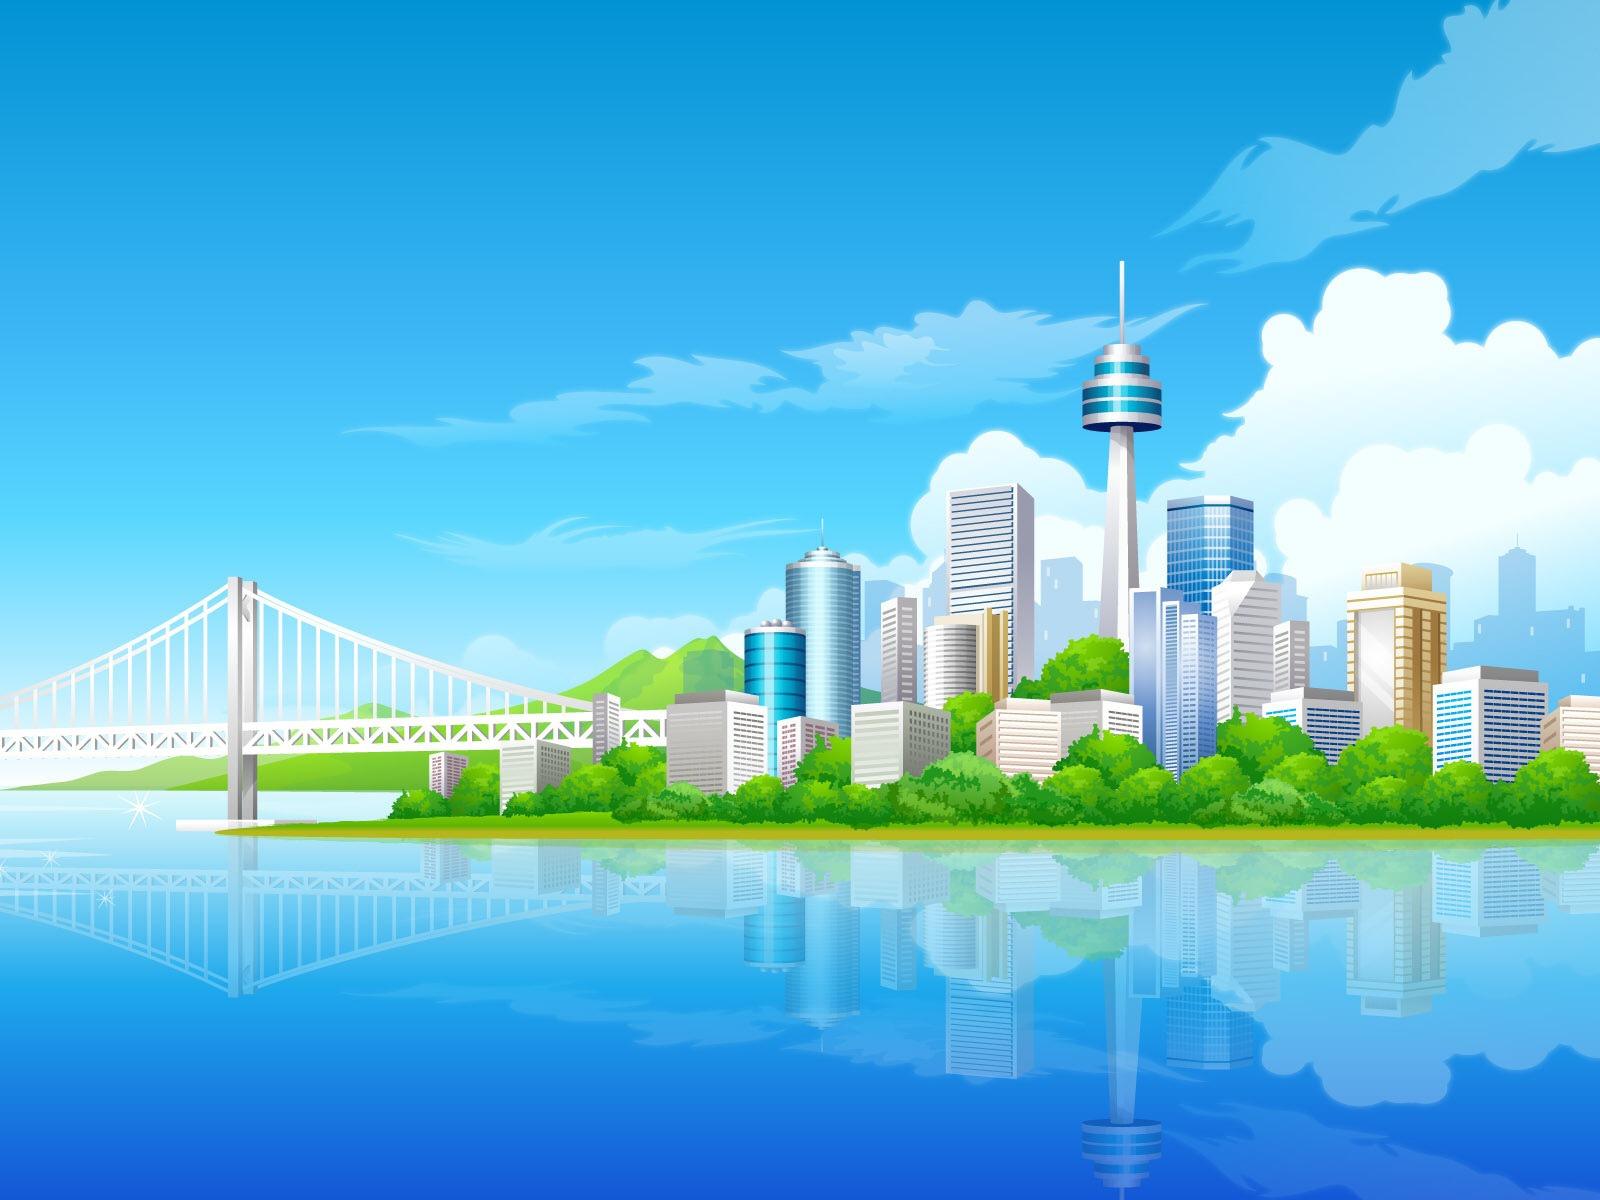 Blue city wallpaper vector 3d wallpapers in jpg format for for Modern 3d wallpaper